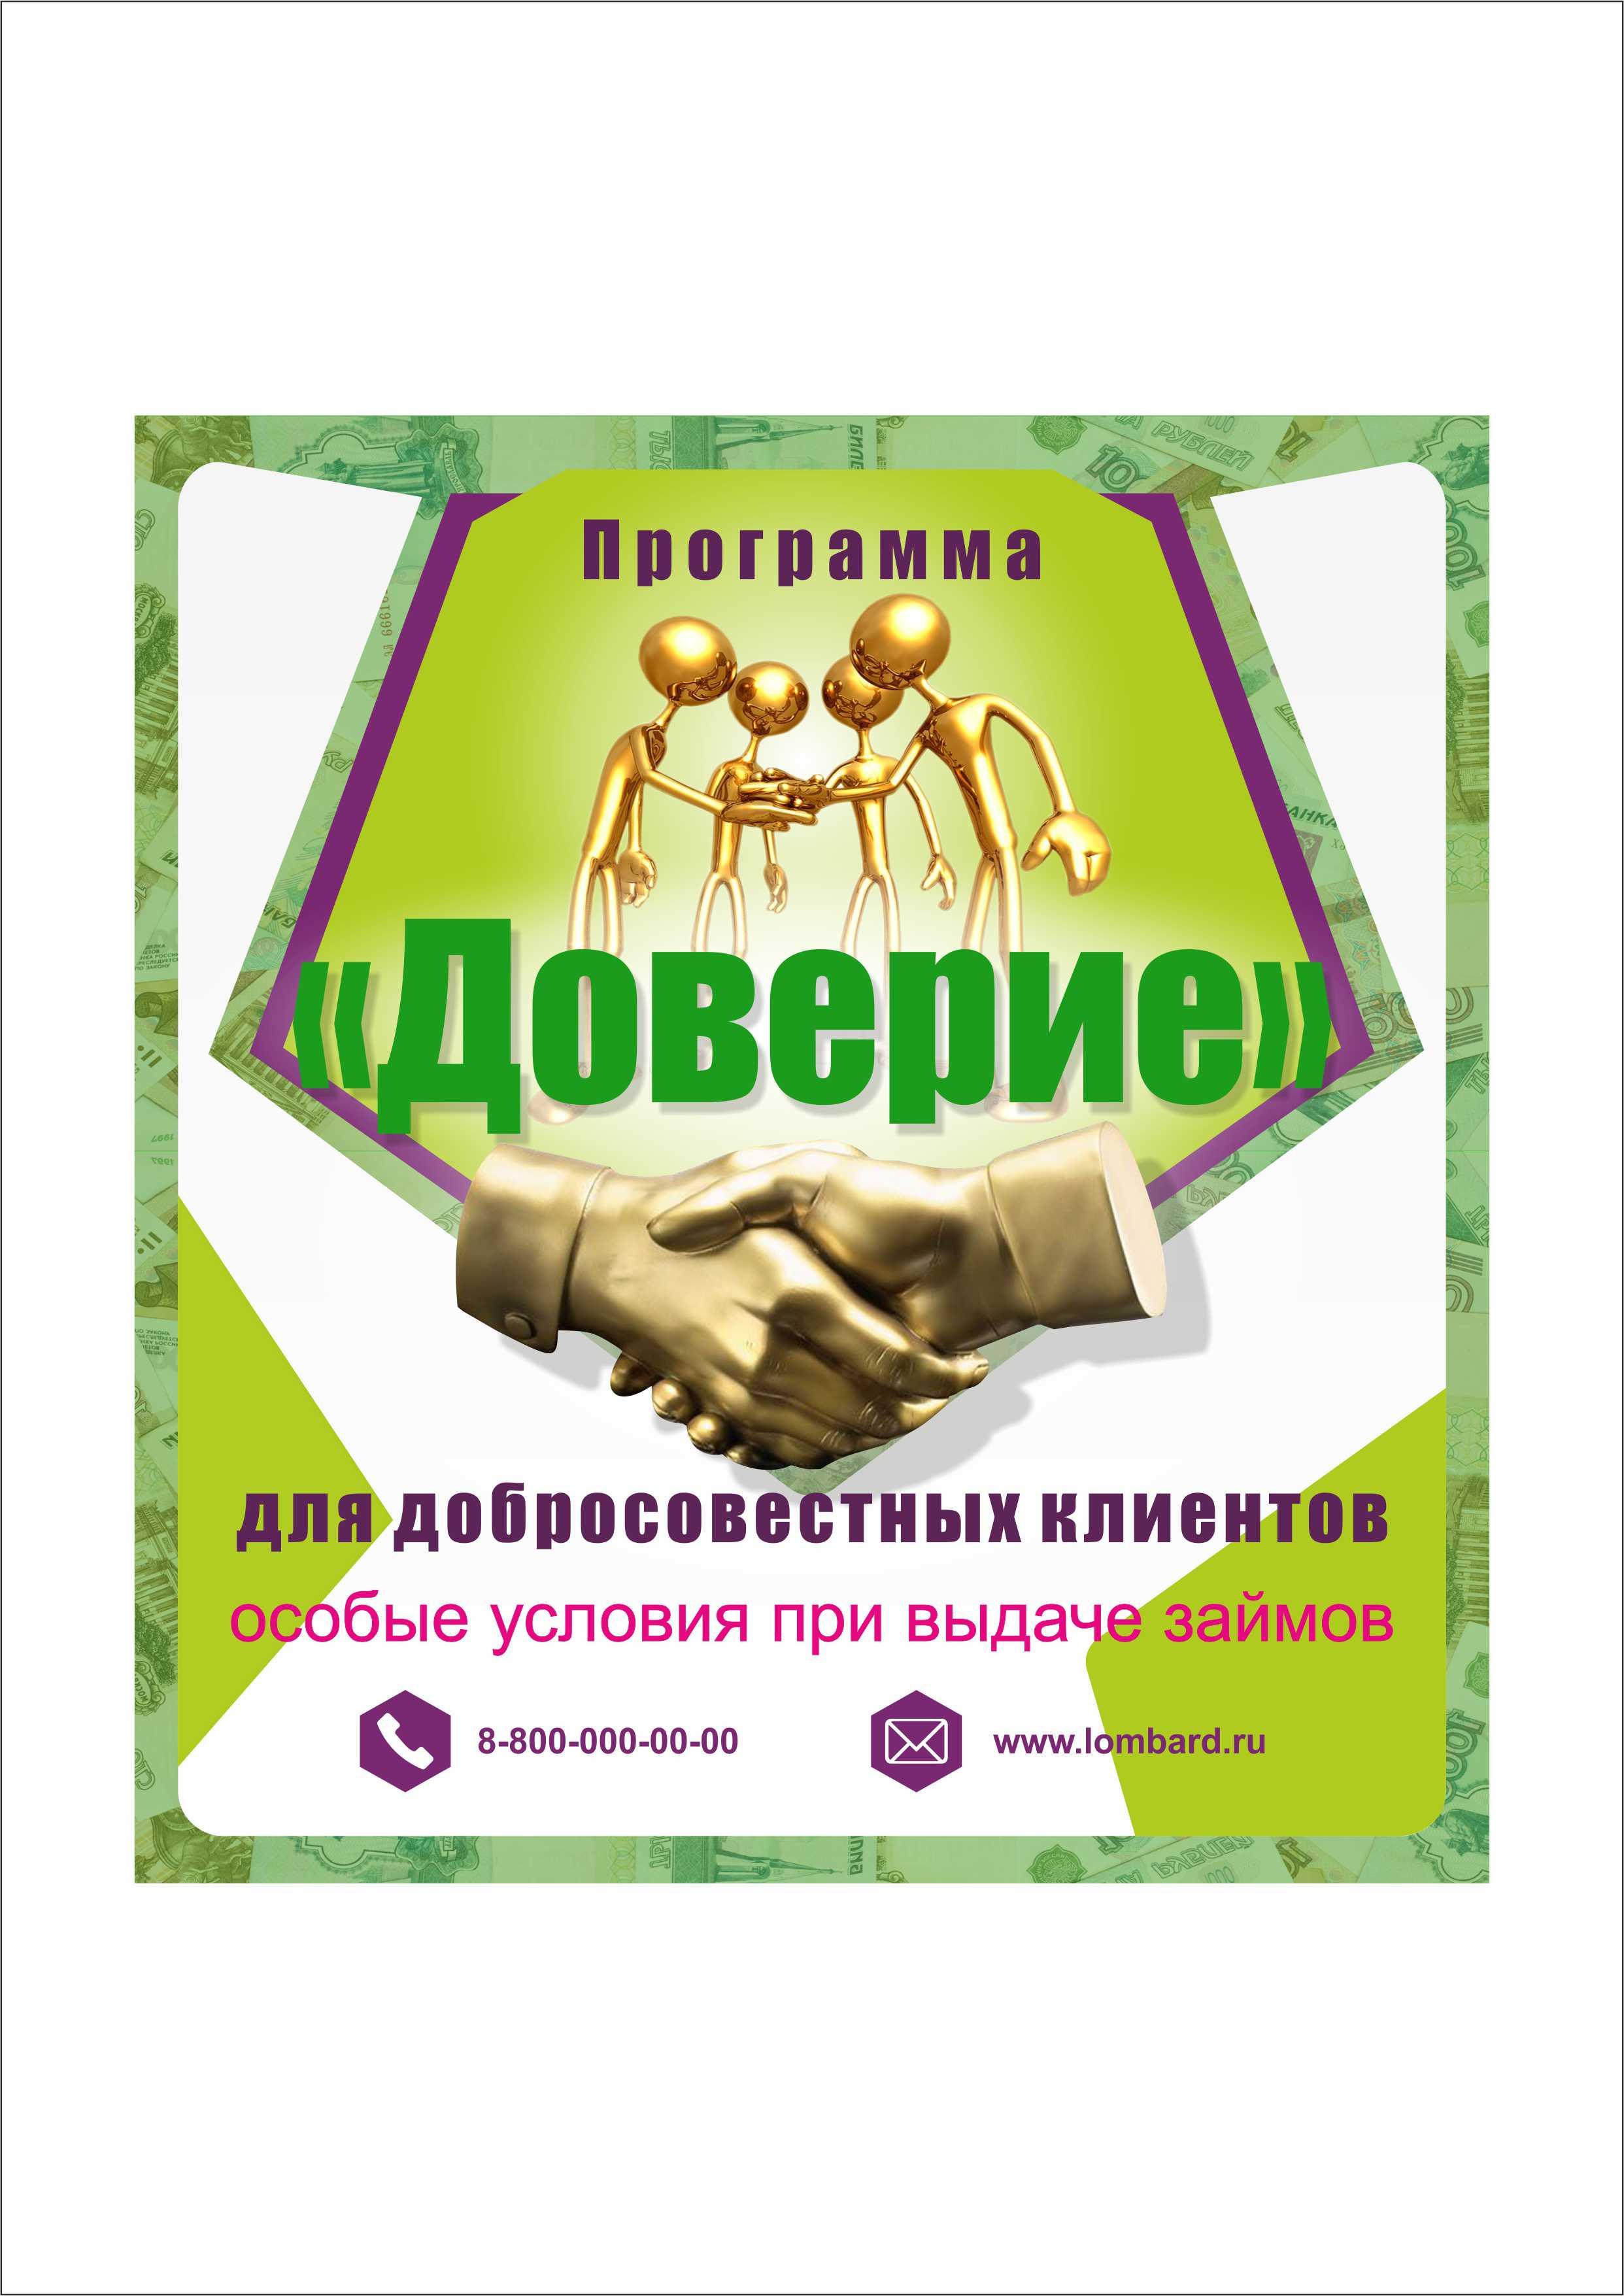 Дизайн плаката по программе лояльности ломбарда фото f_3965c6124b46a3e0.jpg